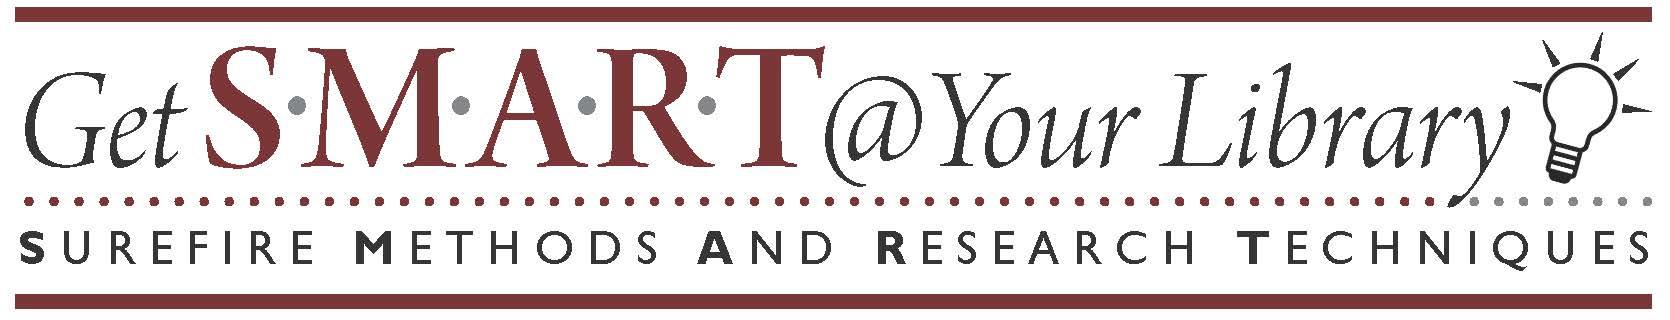 Tamu library dissertation search